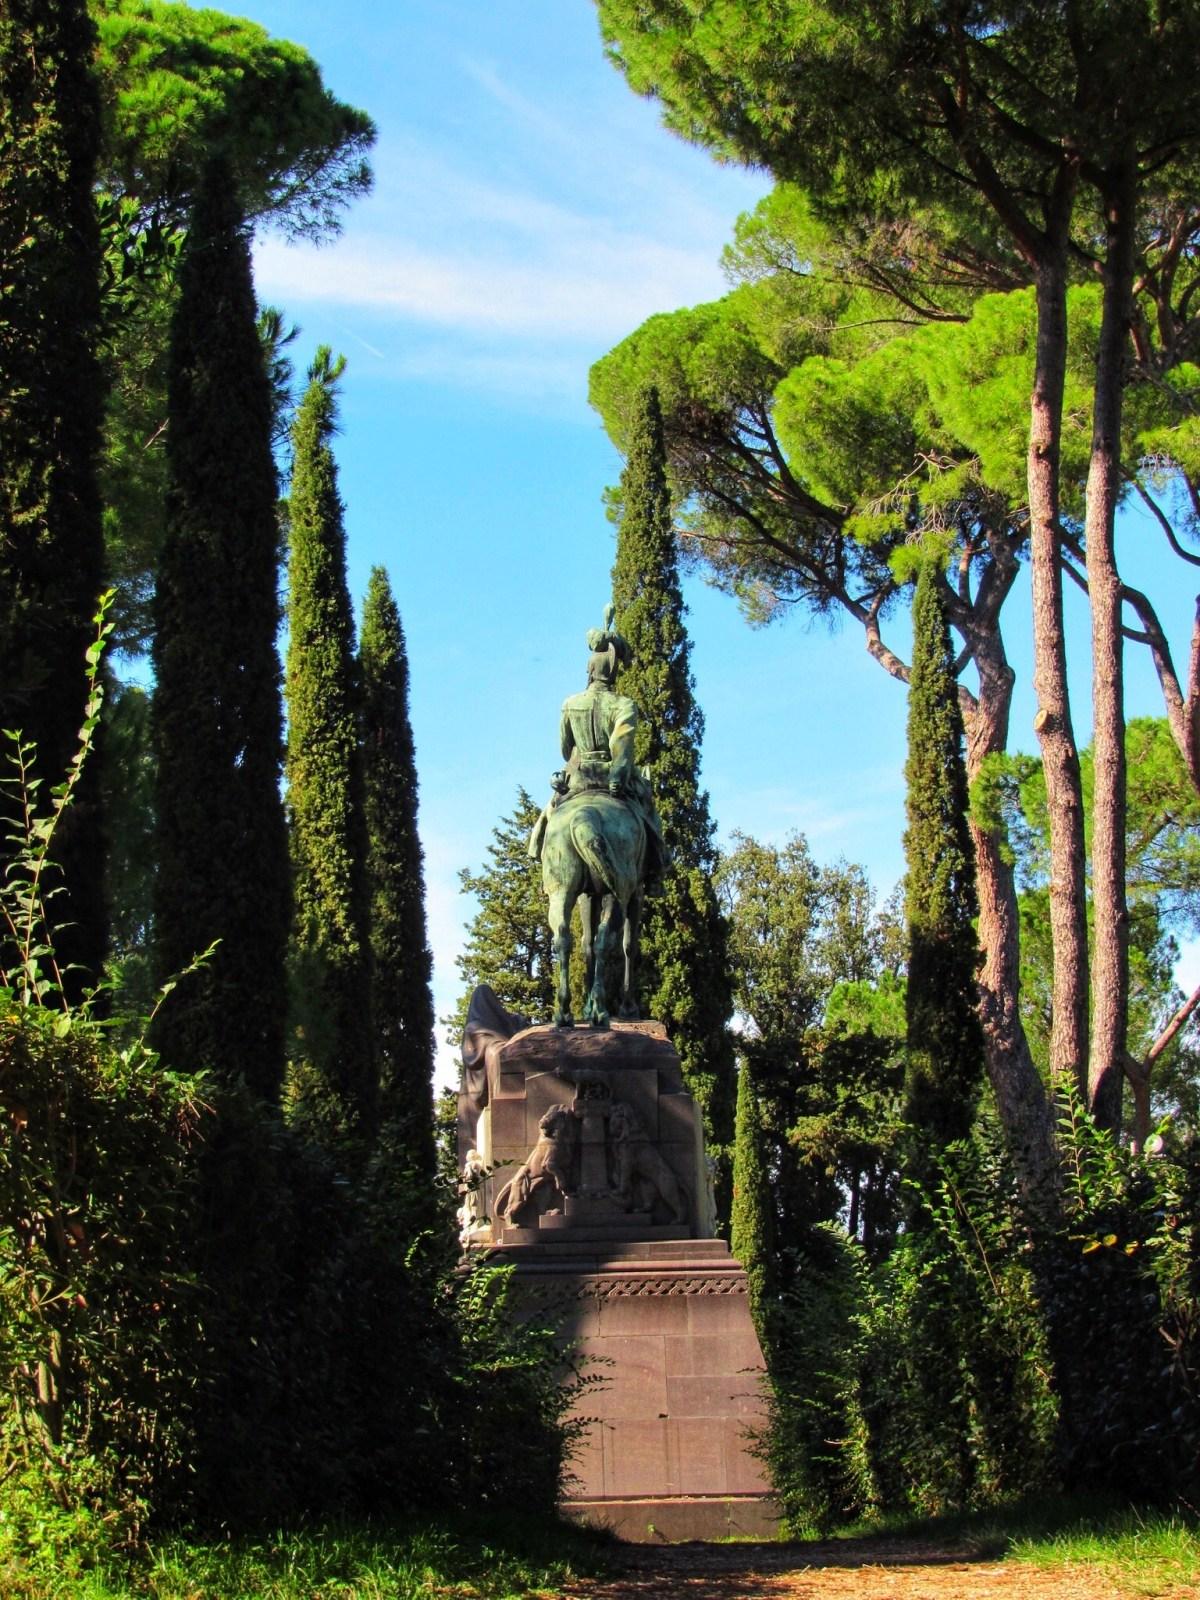 Jardins de la villa borghese - Rome